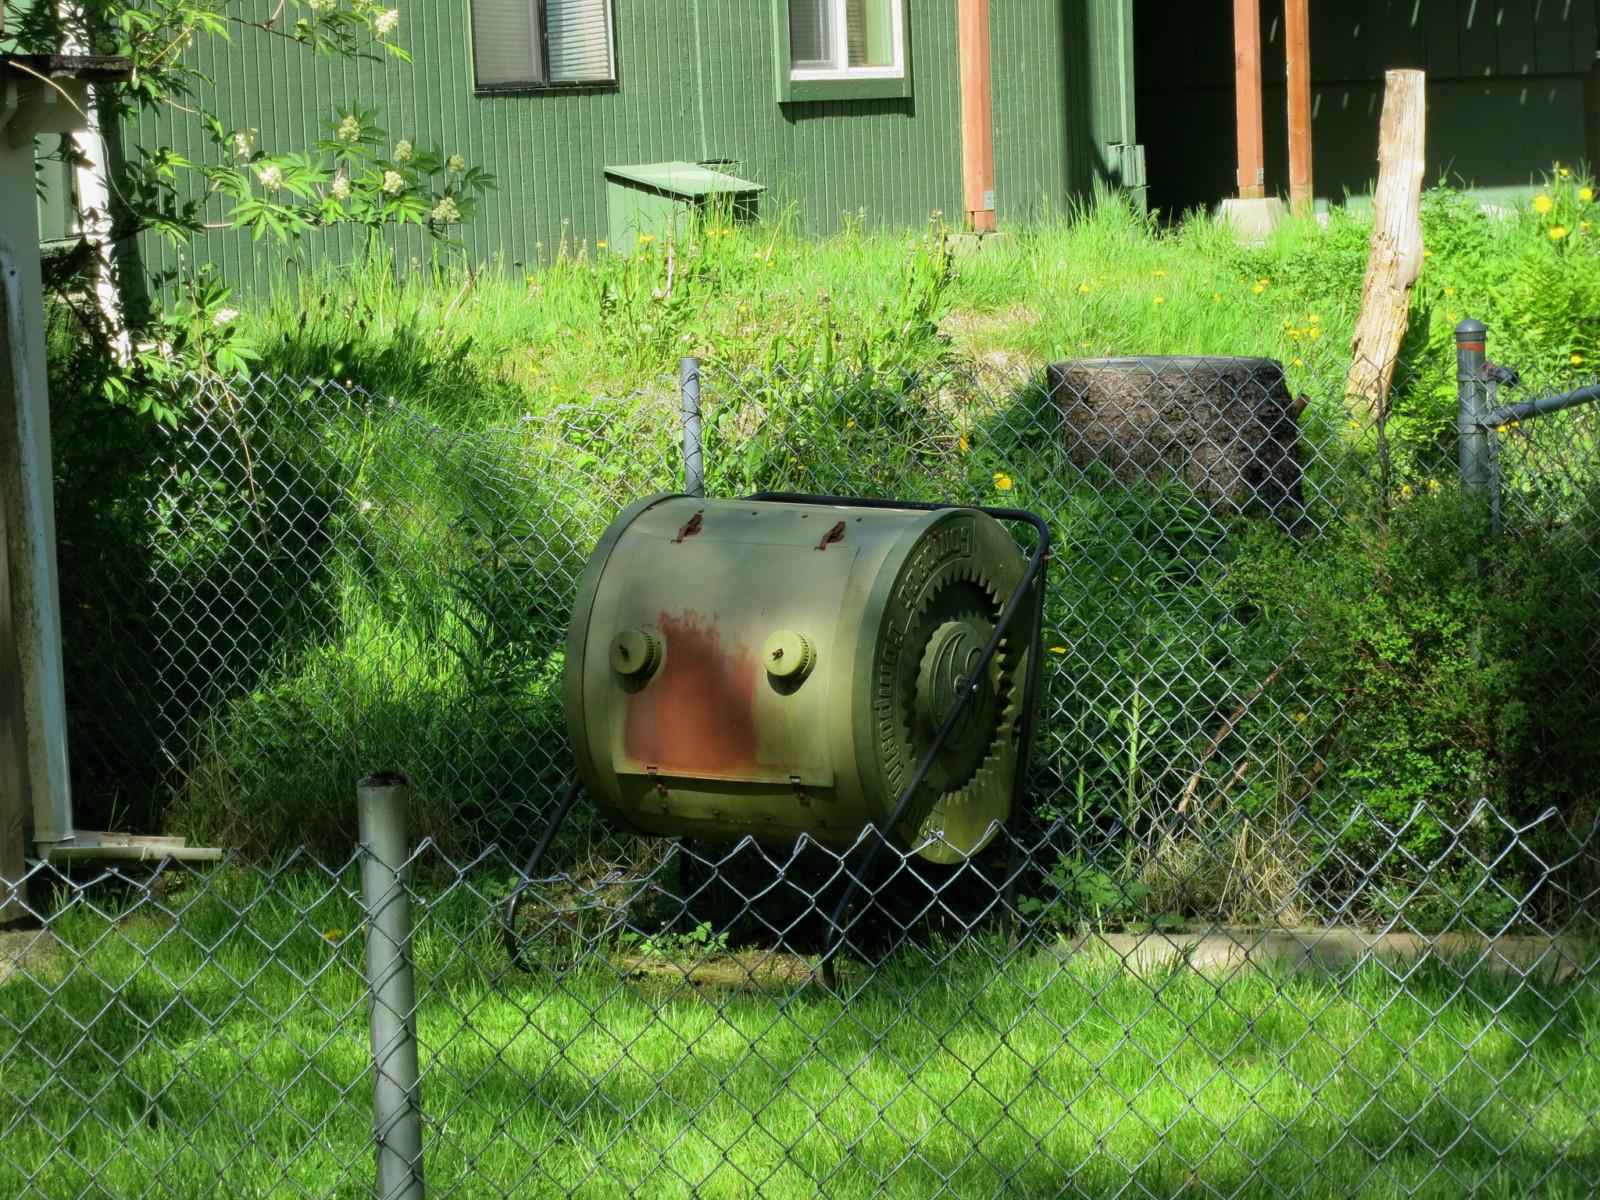 Grumpy Composter